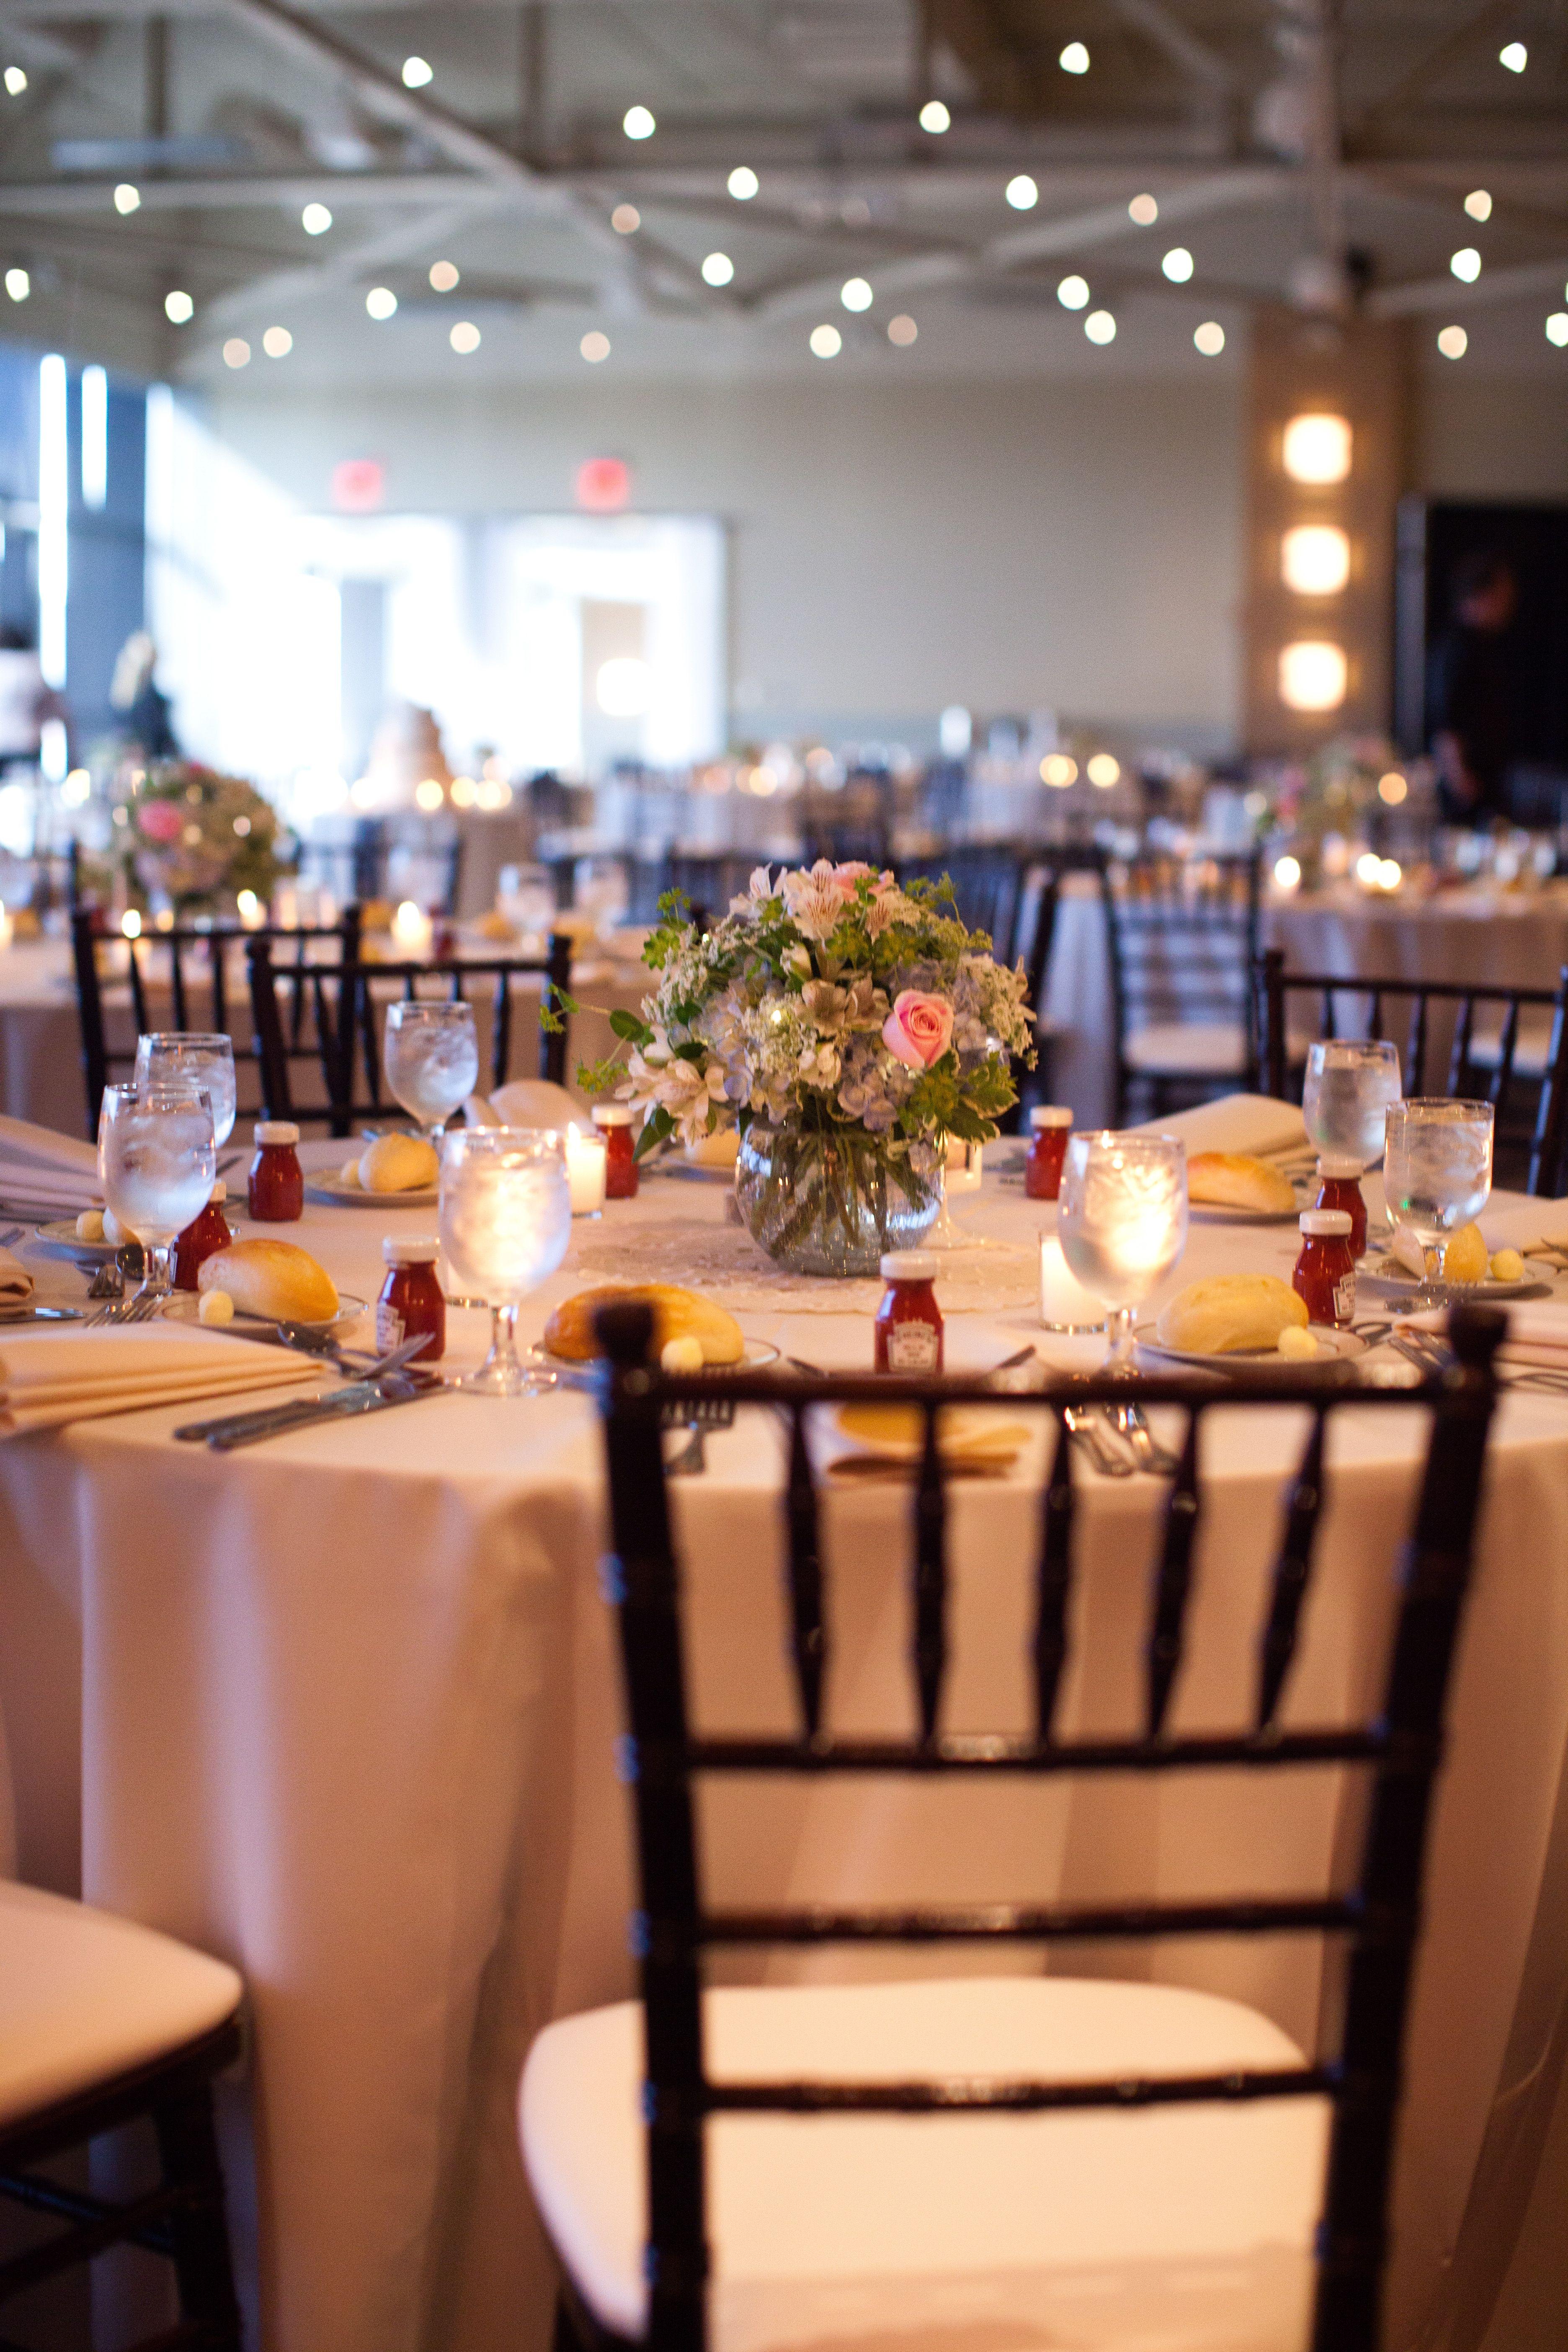 Special Event Rentals Event Rental Event Table Decorations